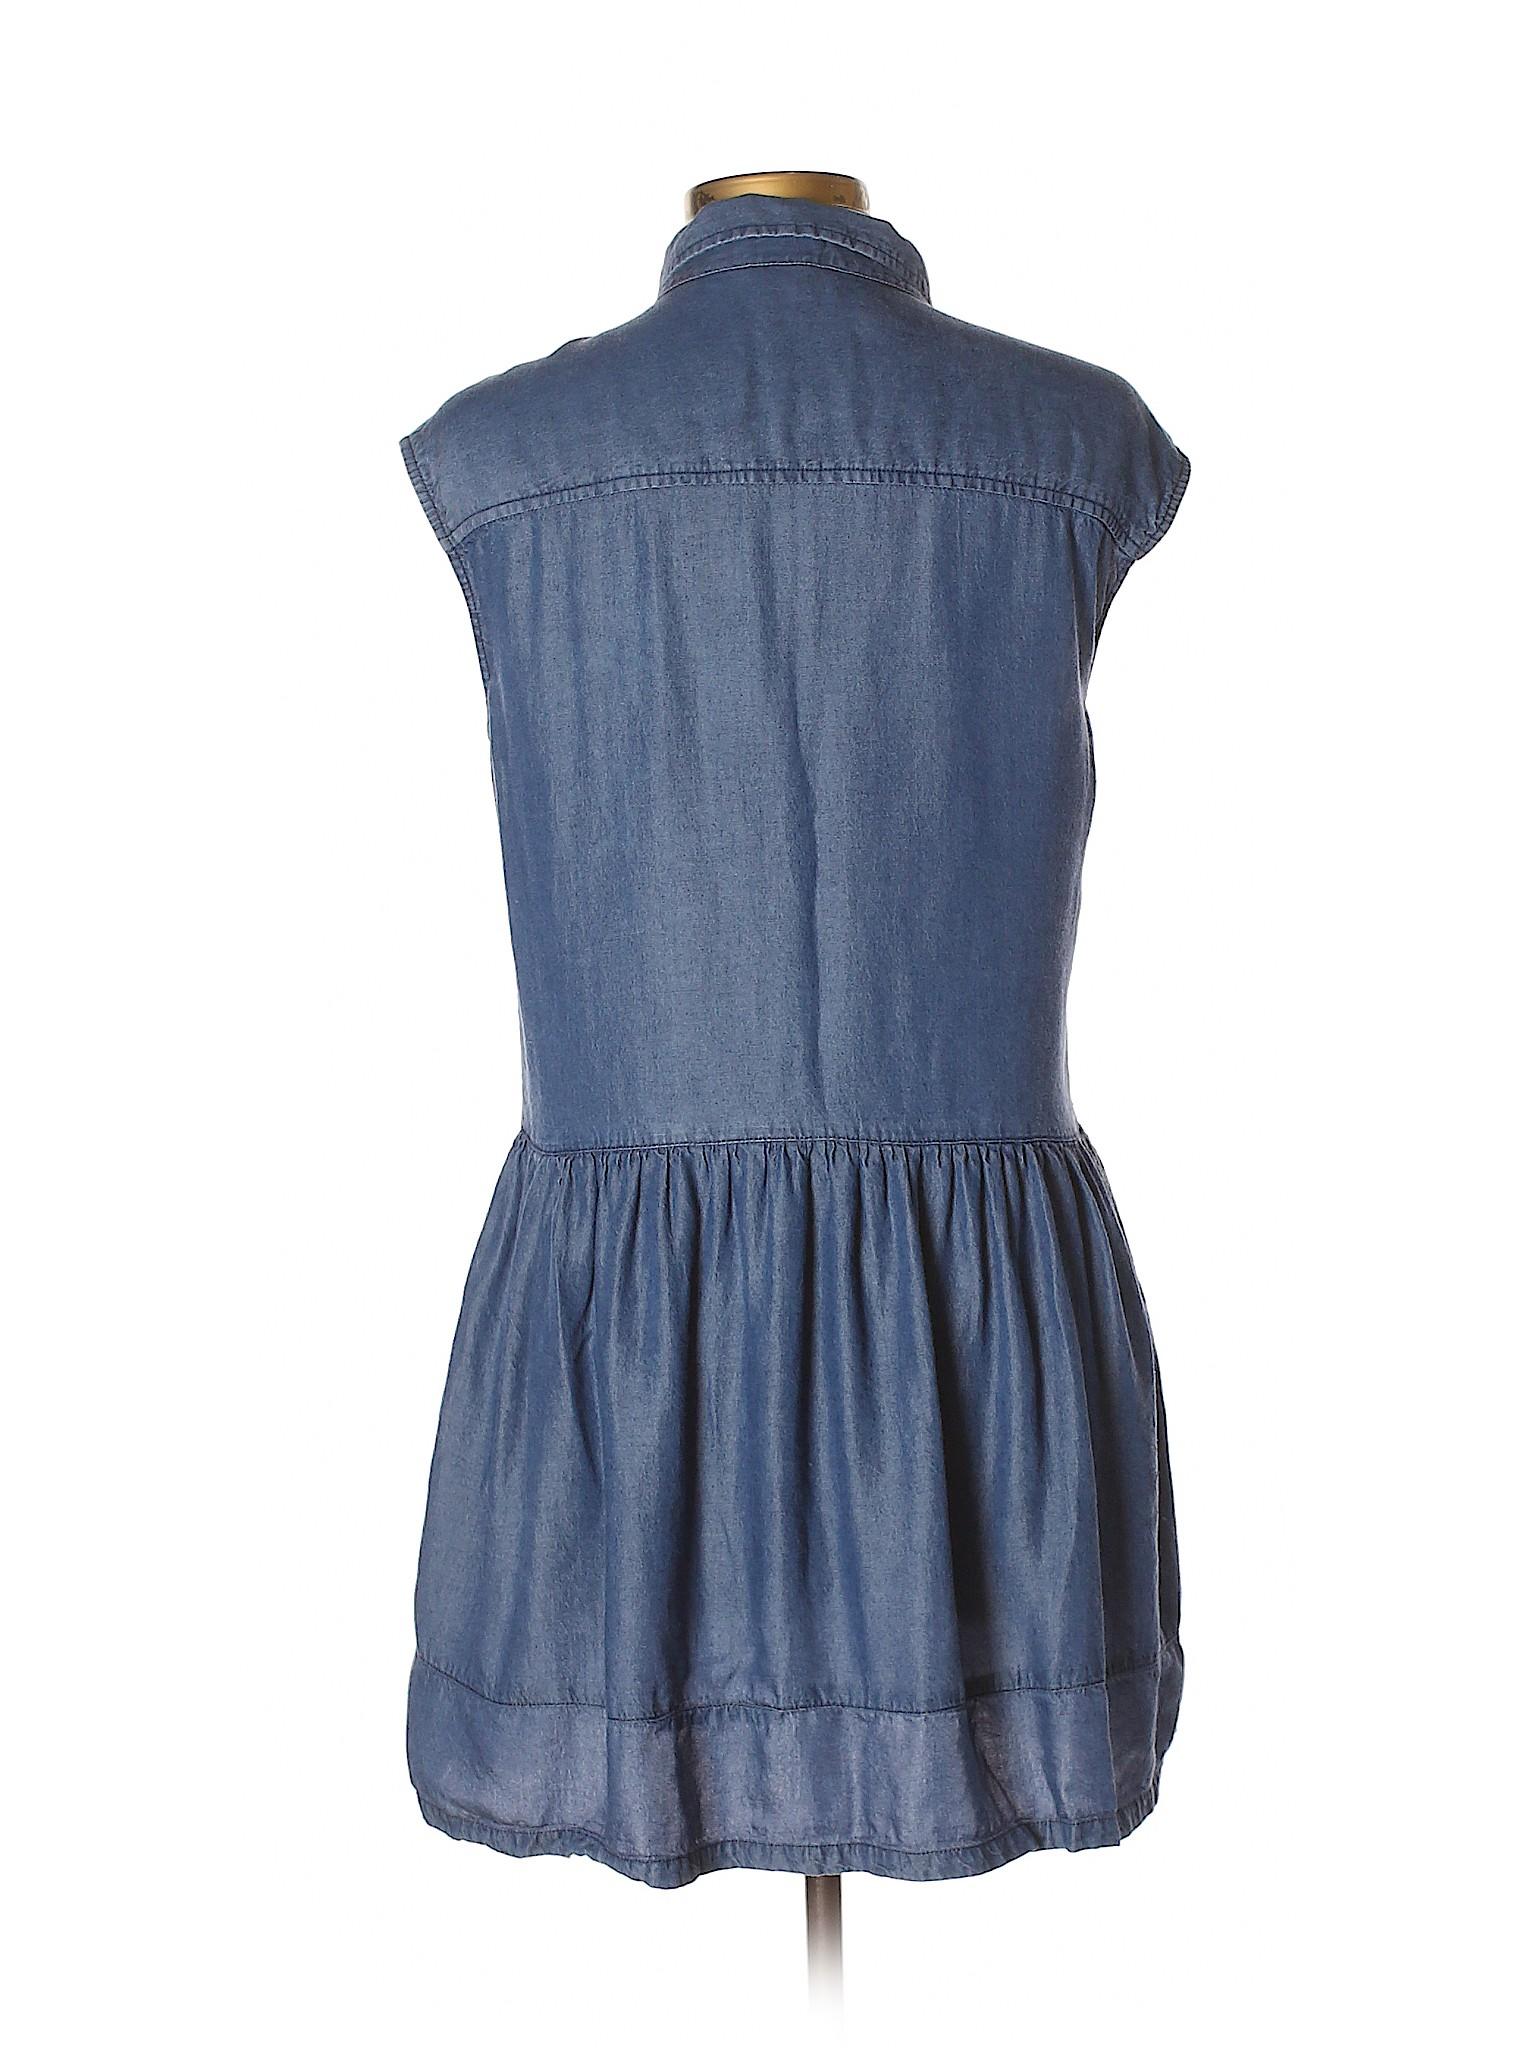 Boutique Dress Casual Nanette L'Amour Lepore winter U1OFRnrU